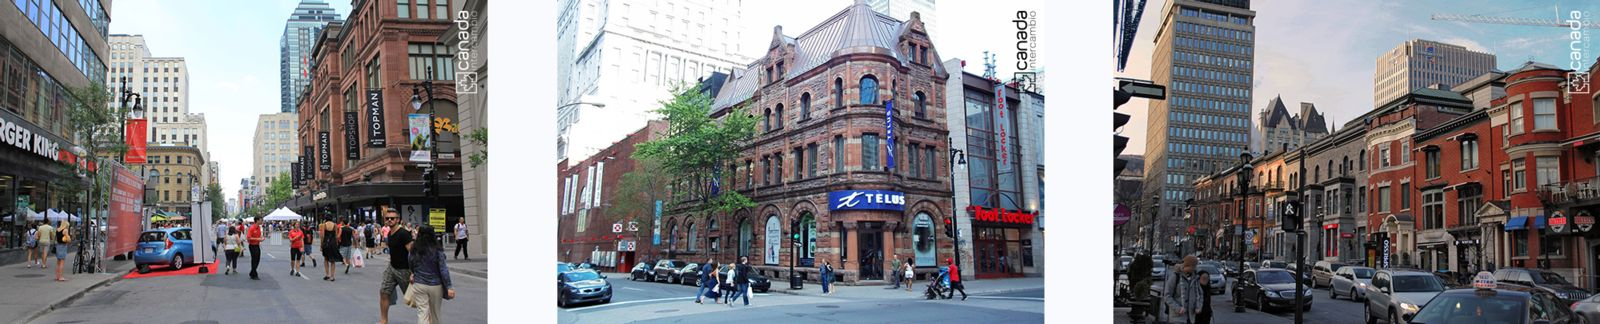 Rue Saint Catherine, Montreal